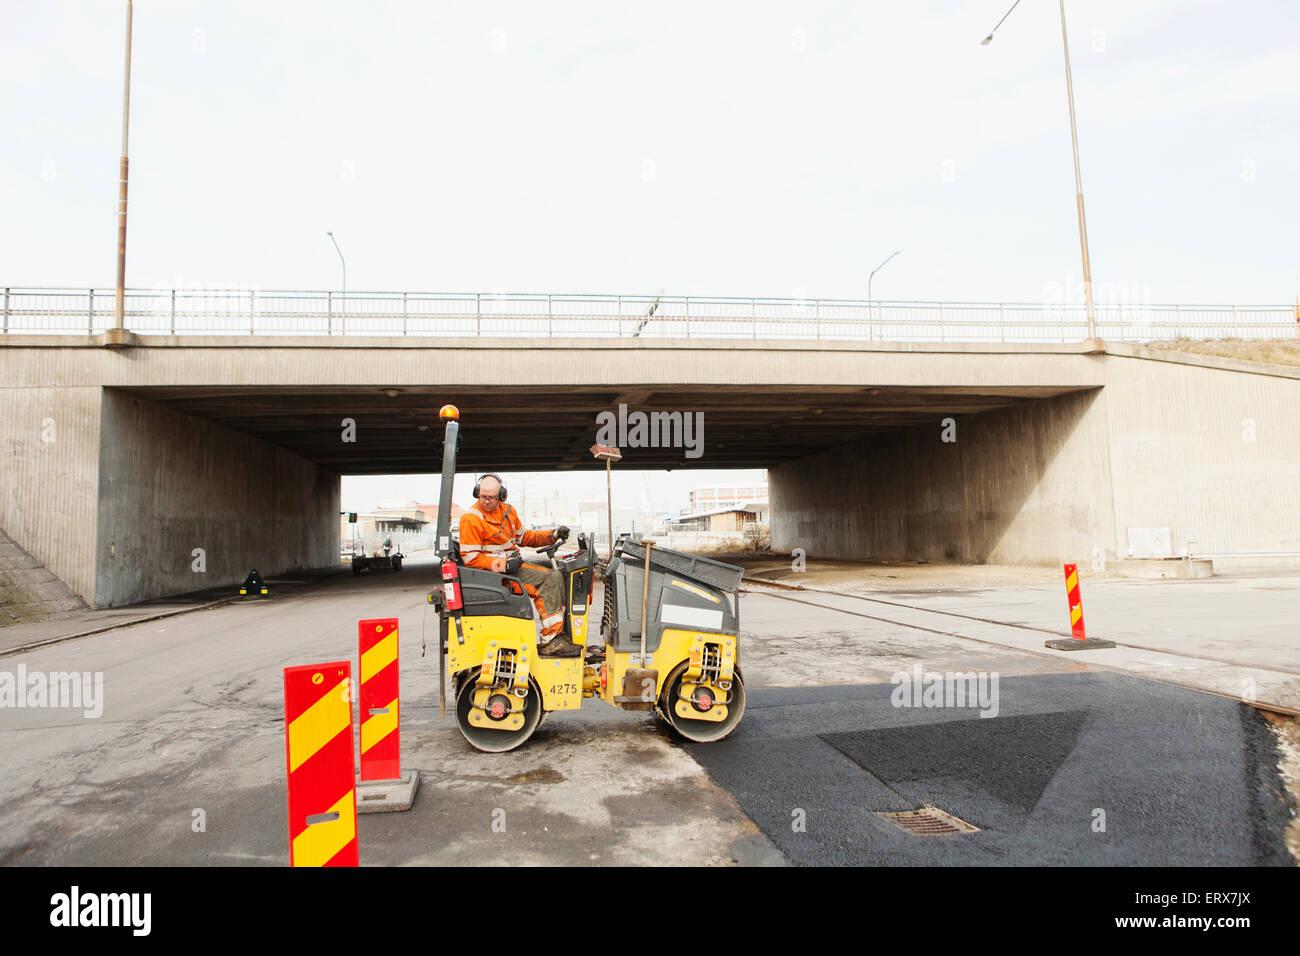 Manual worker driving steamroller on tar by bridge - Stock Image